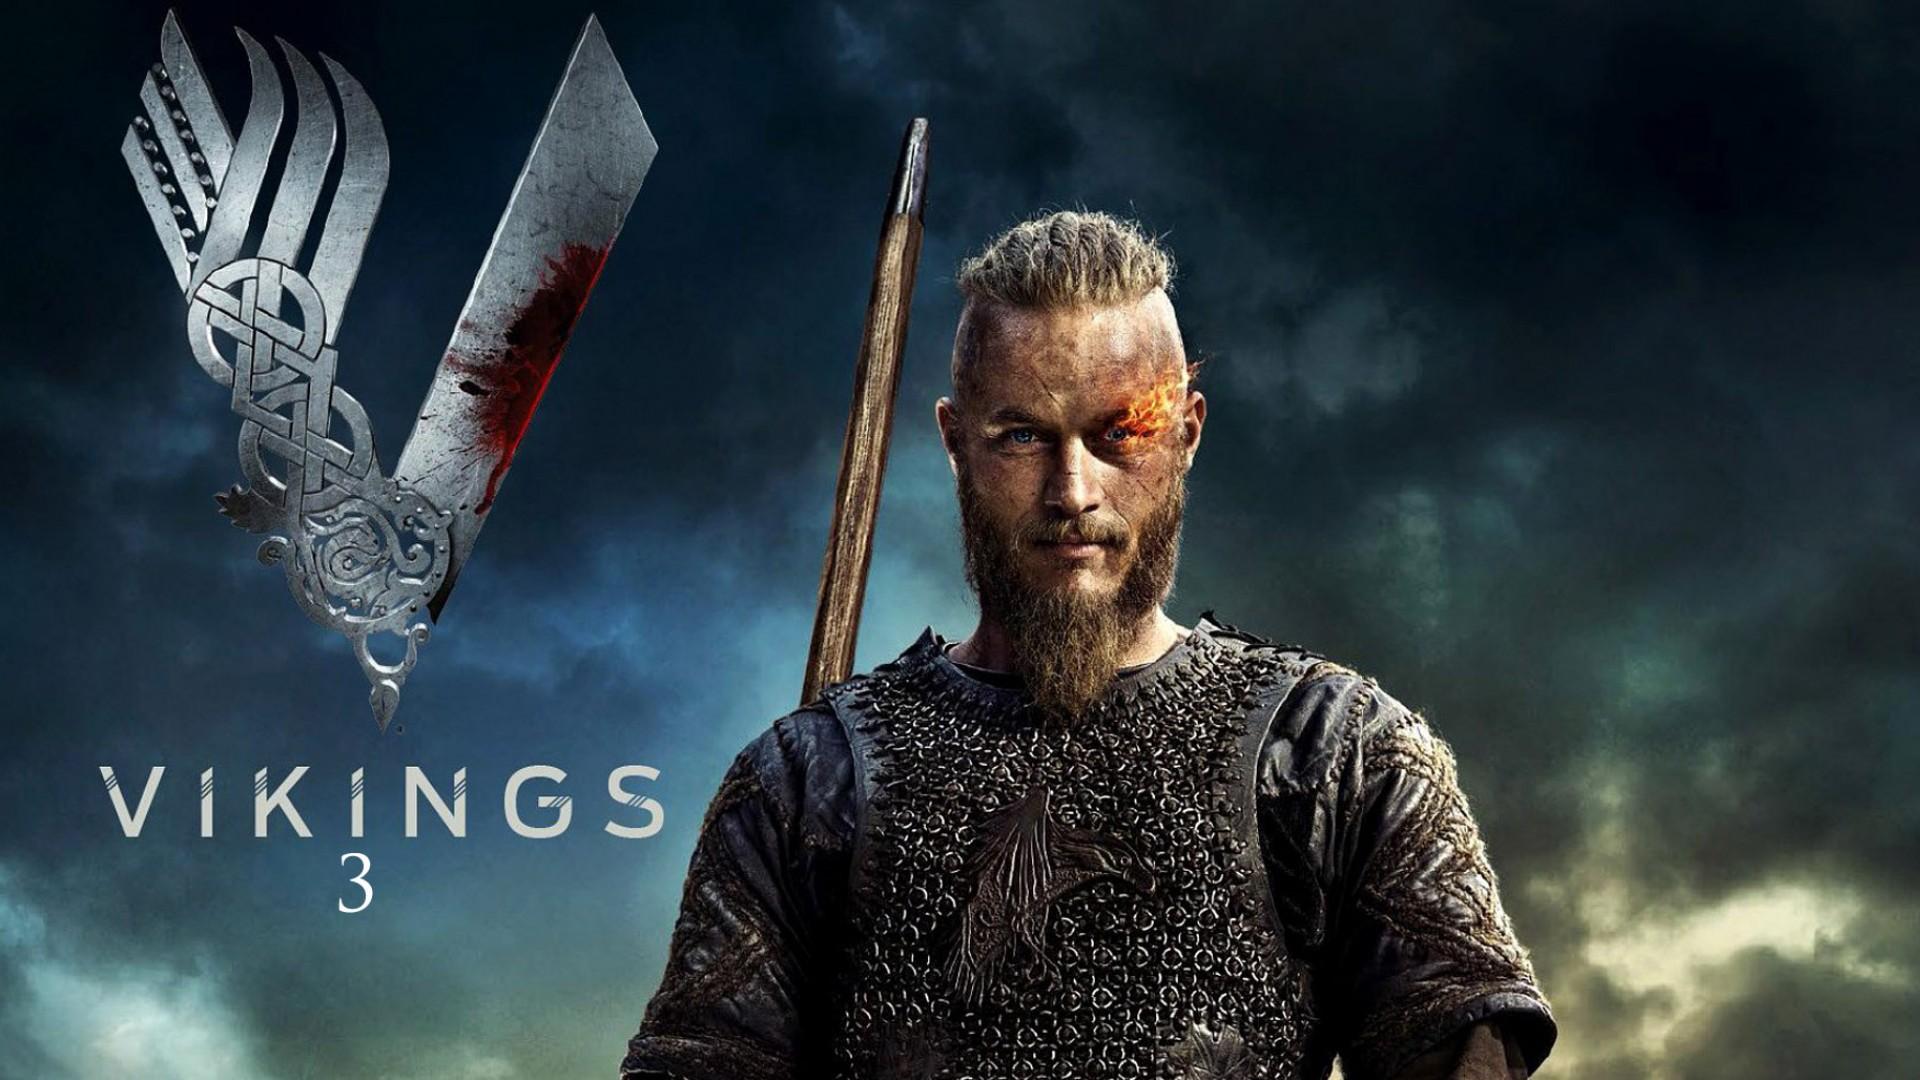 Hd Wallpapers Ragnar Vikings History Channel 3000 X 2000 1166 Kb Jpeg 1920x1080